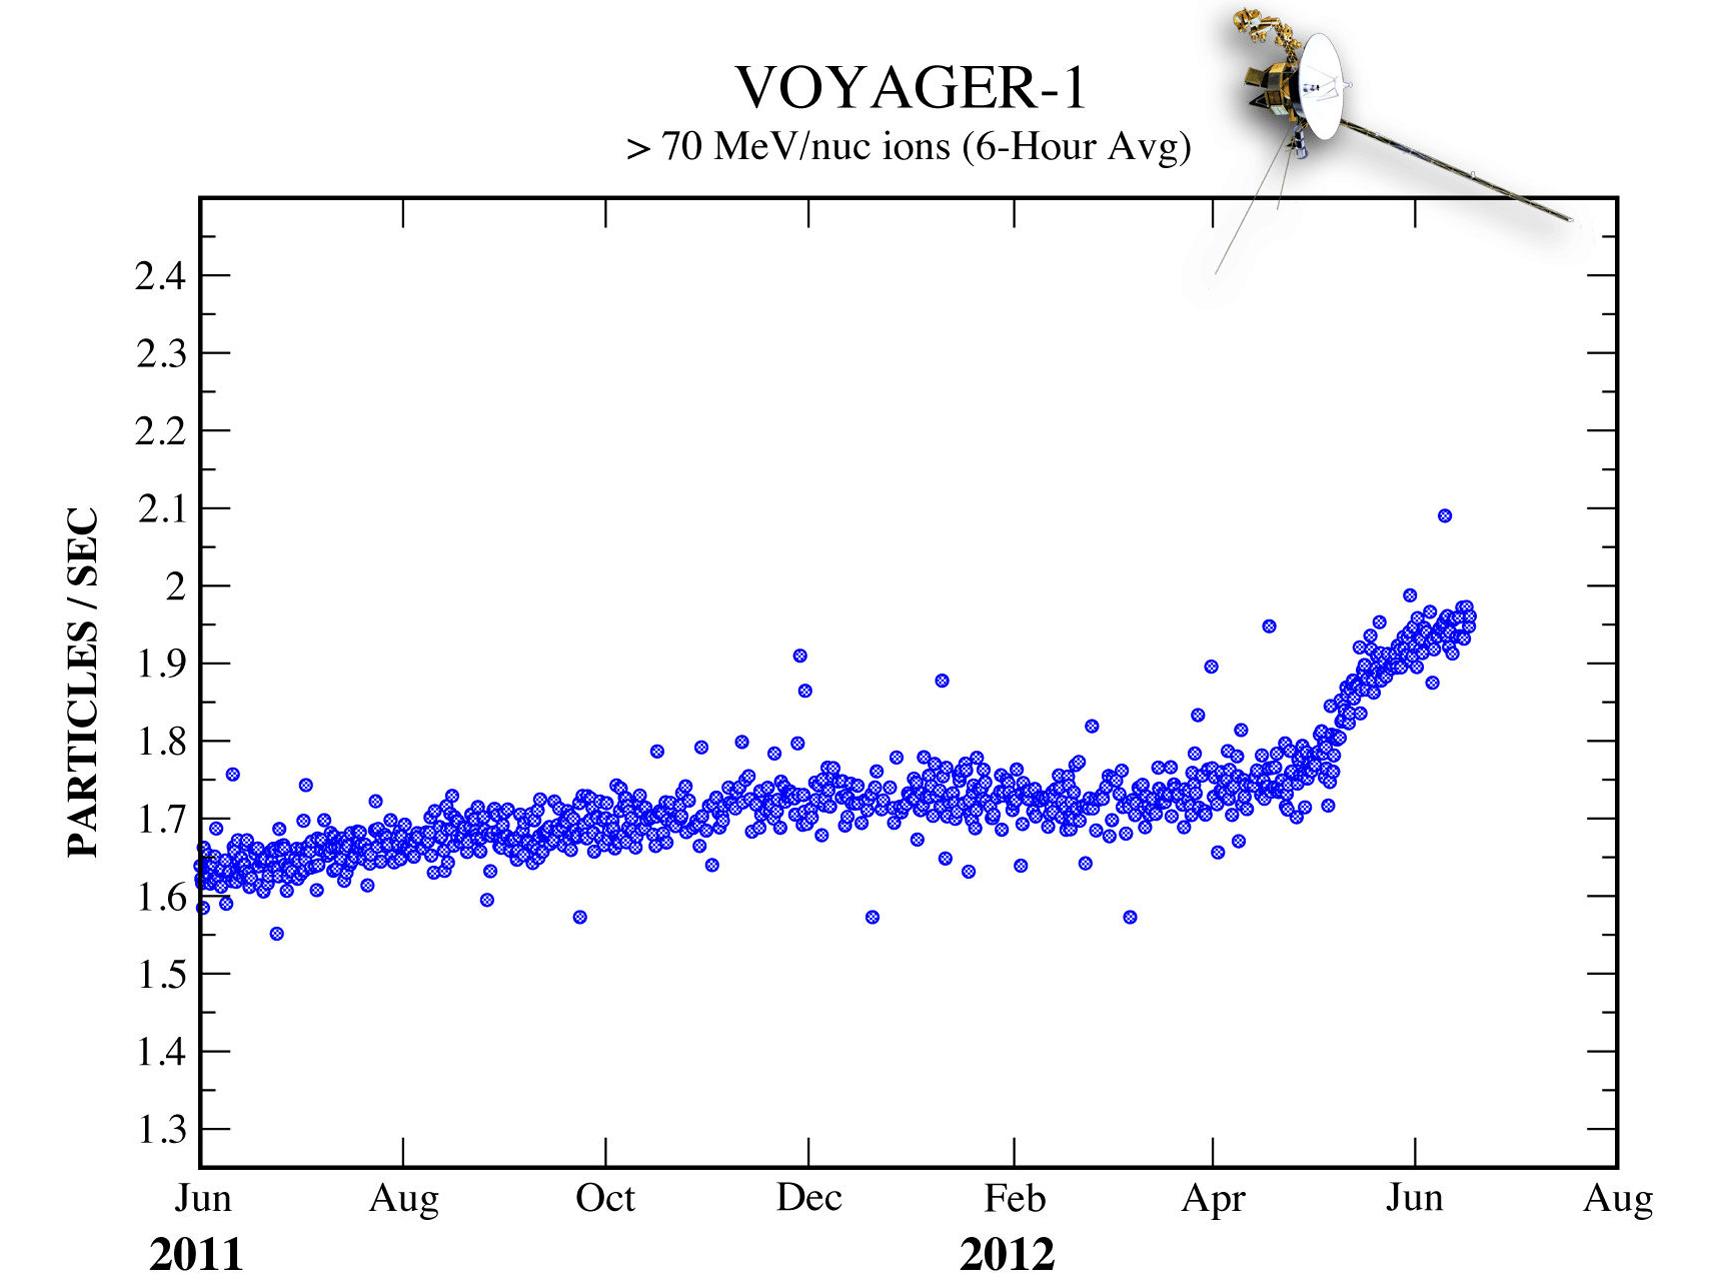 voyager 2 speed - photo #9